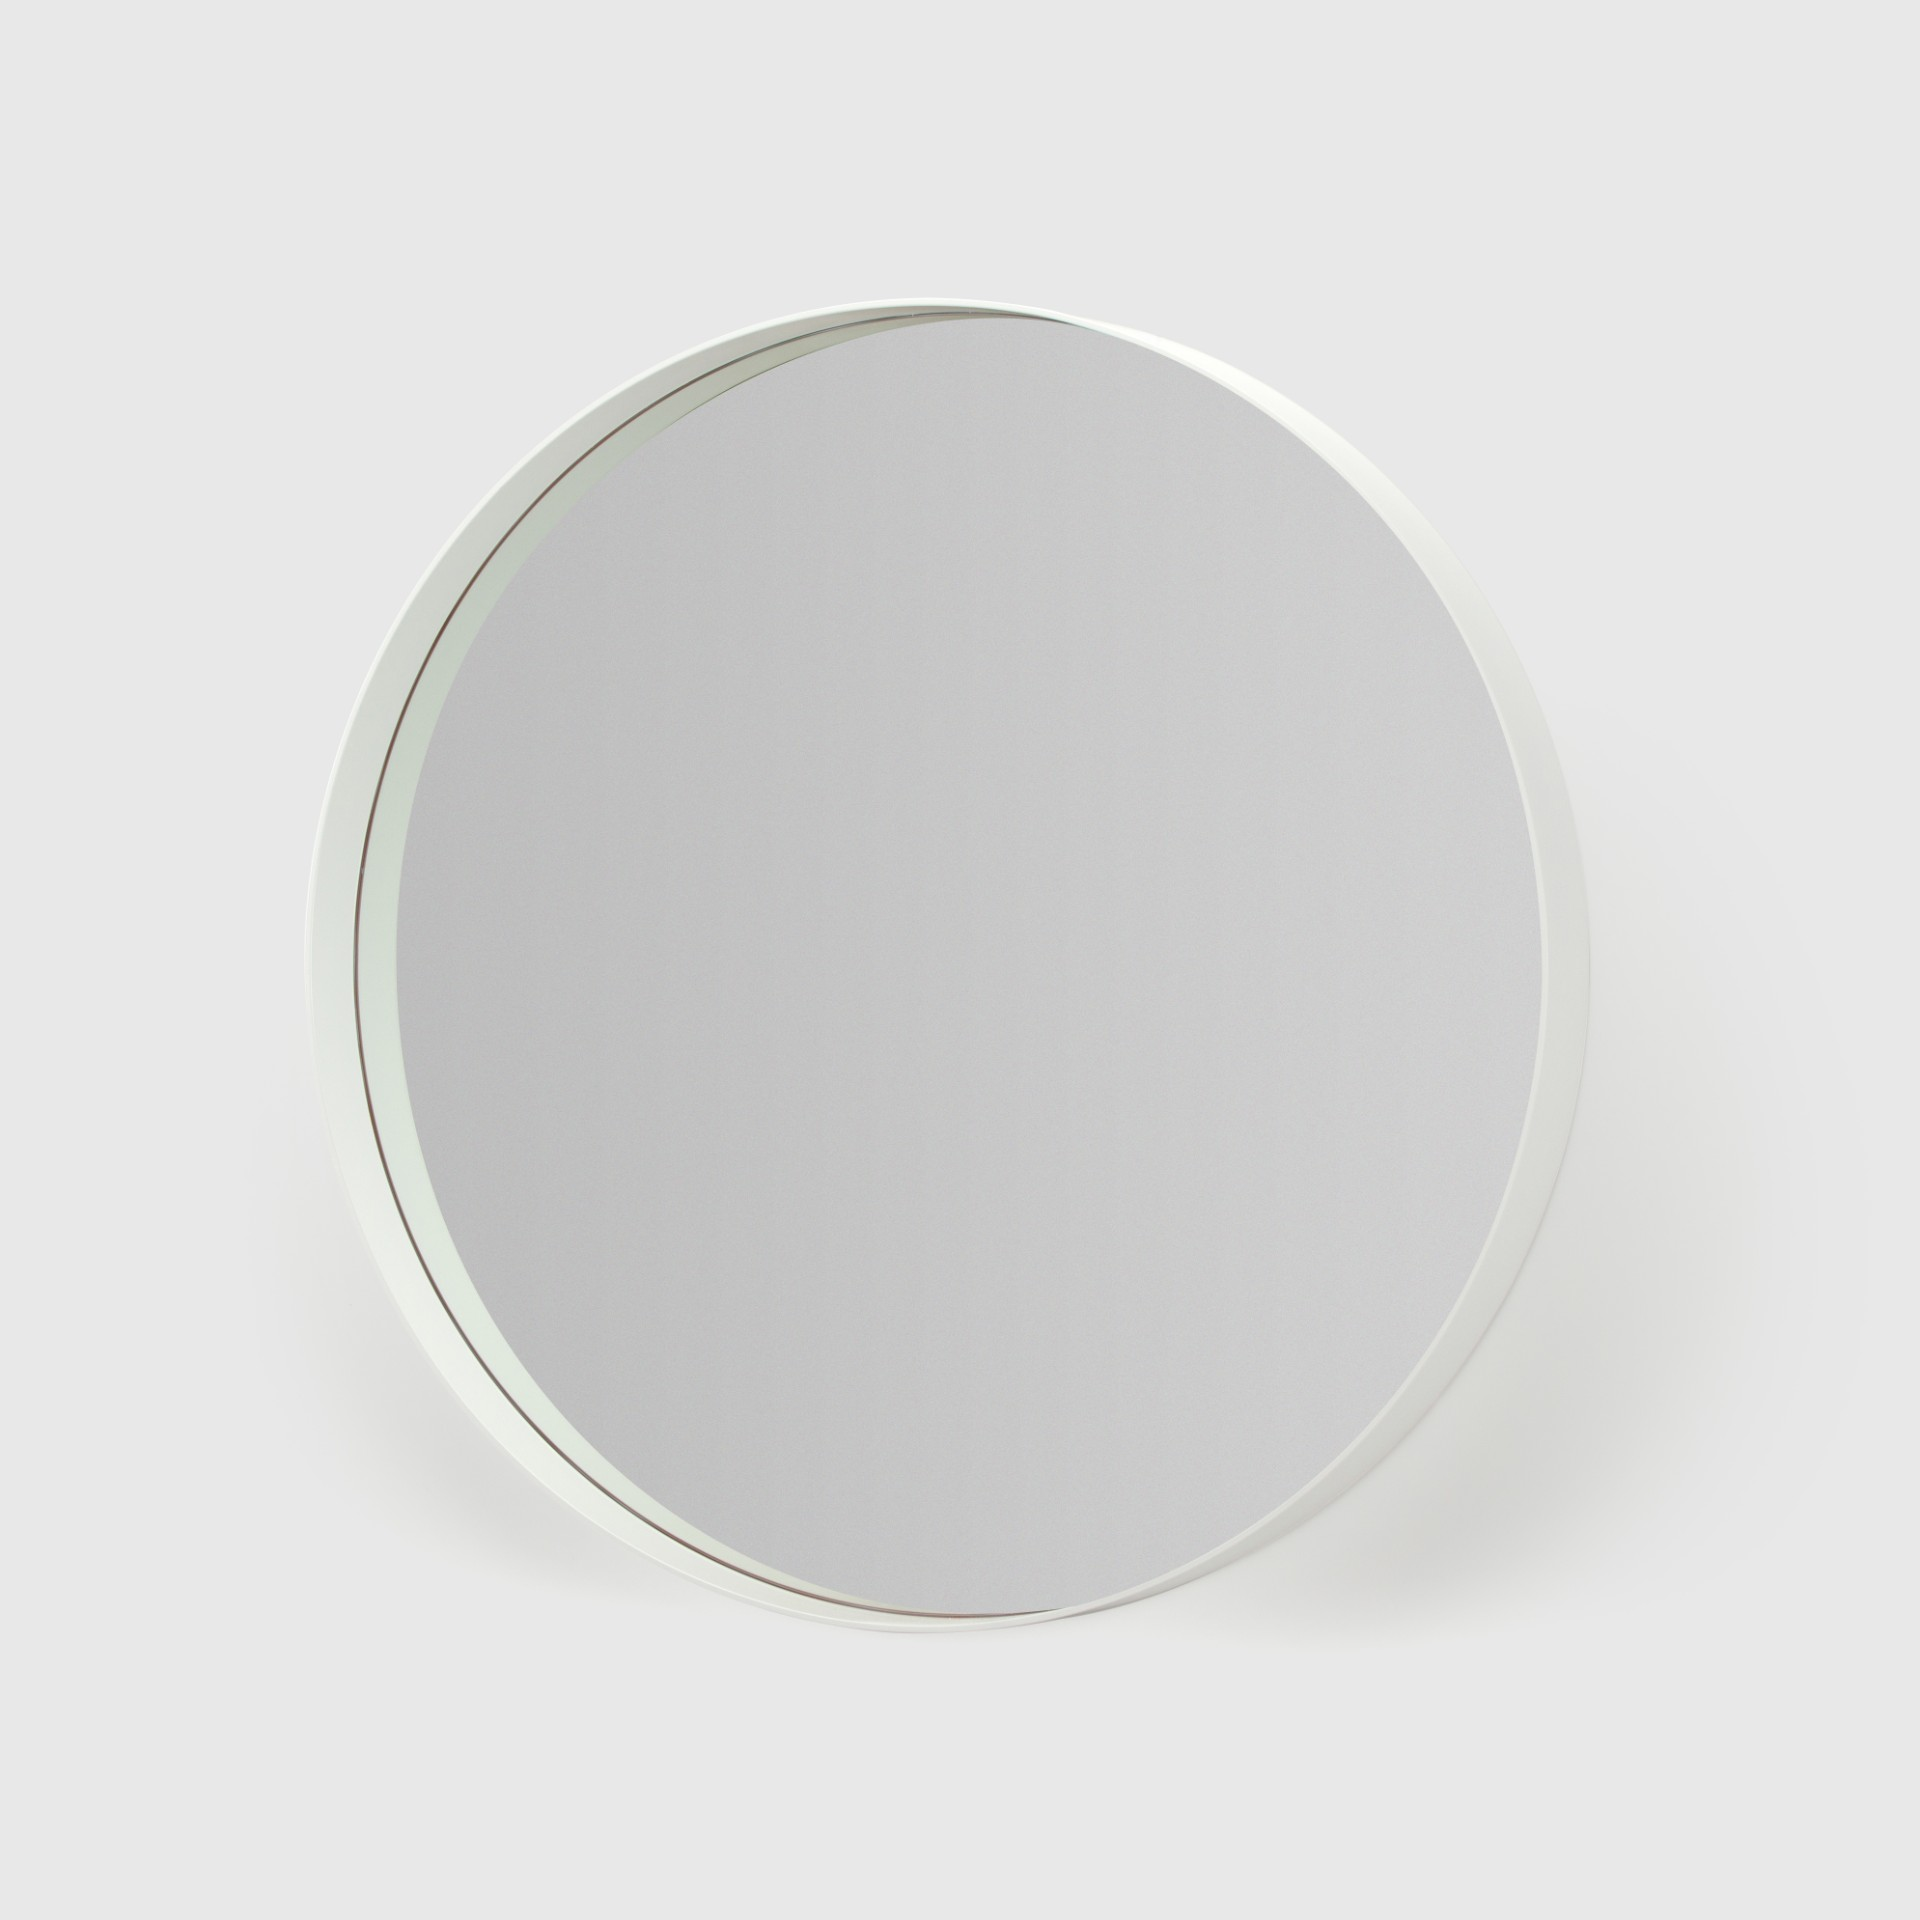 Spegel_9